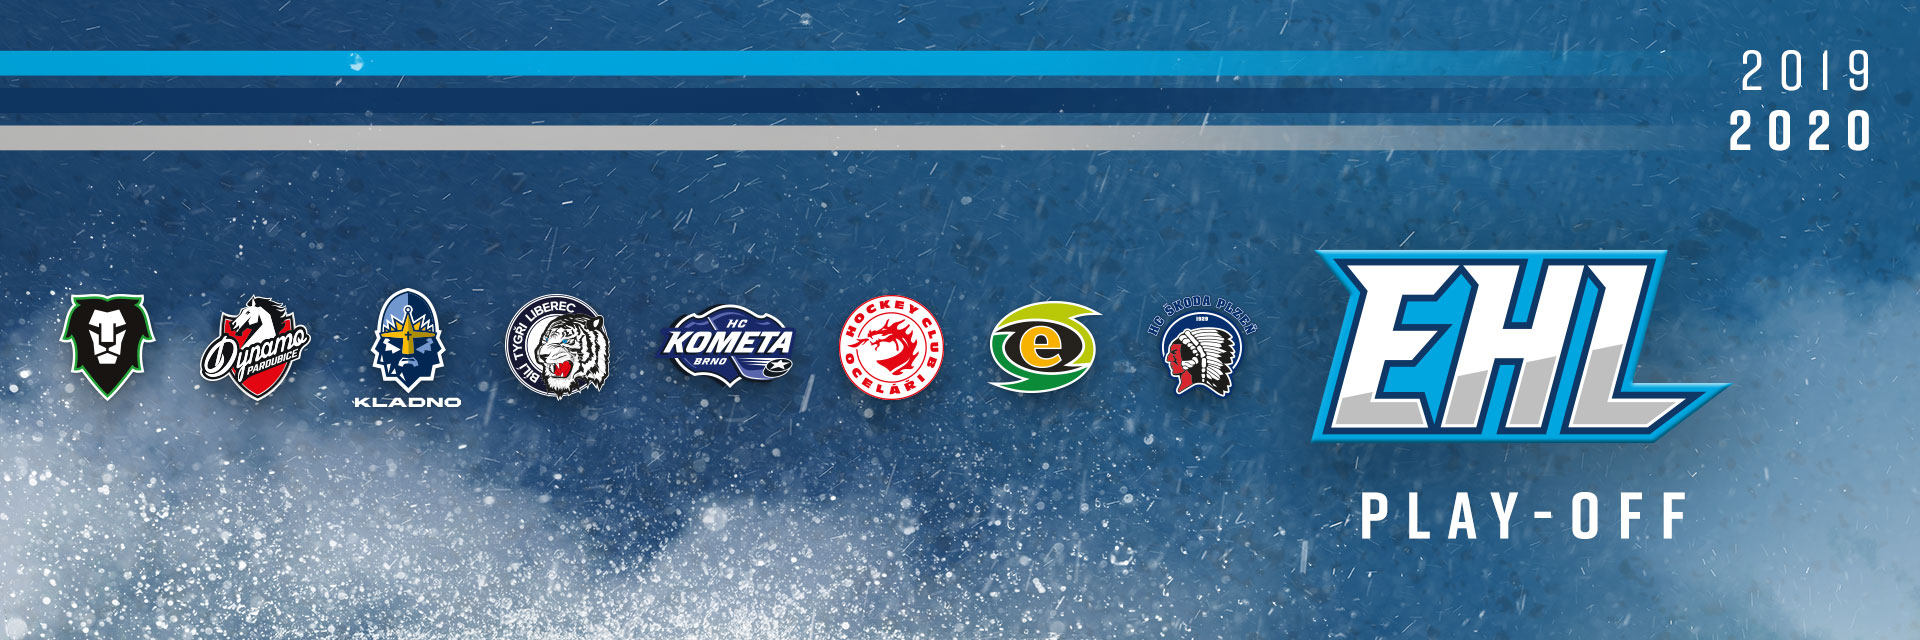 esport-hokejova-liga-play-off